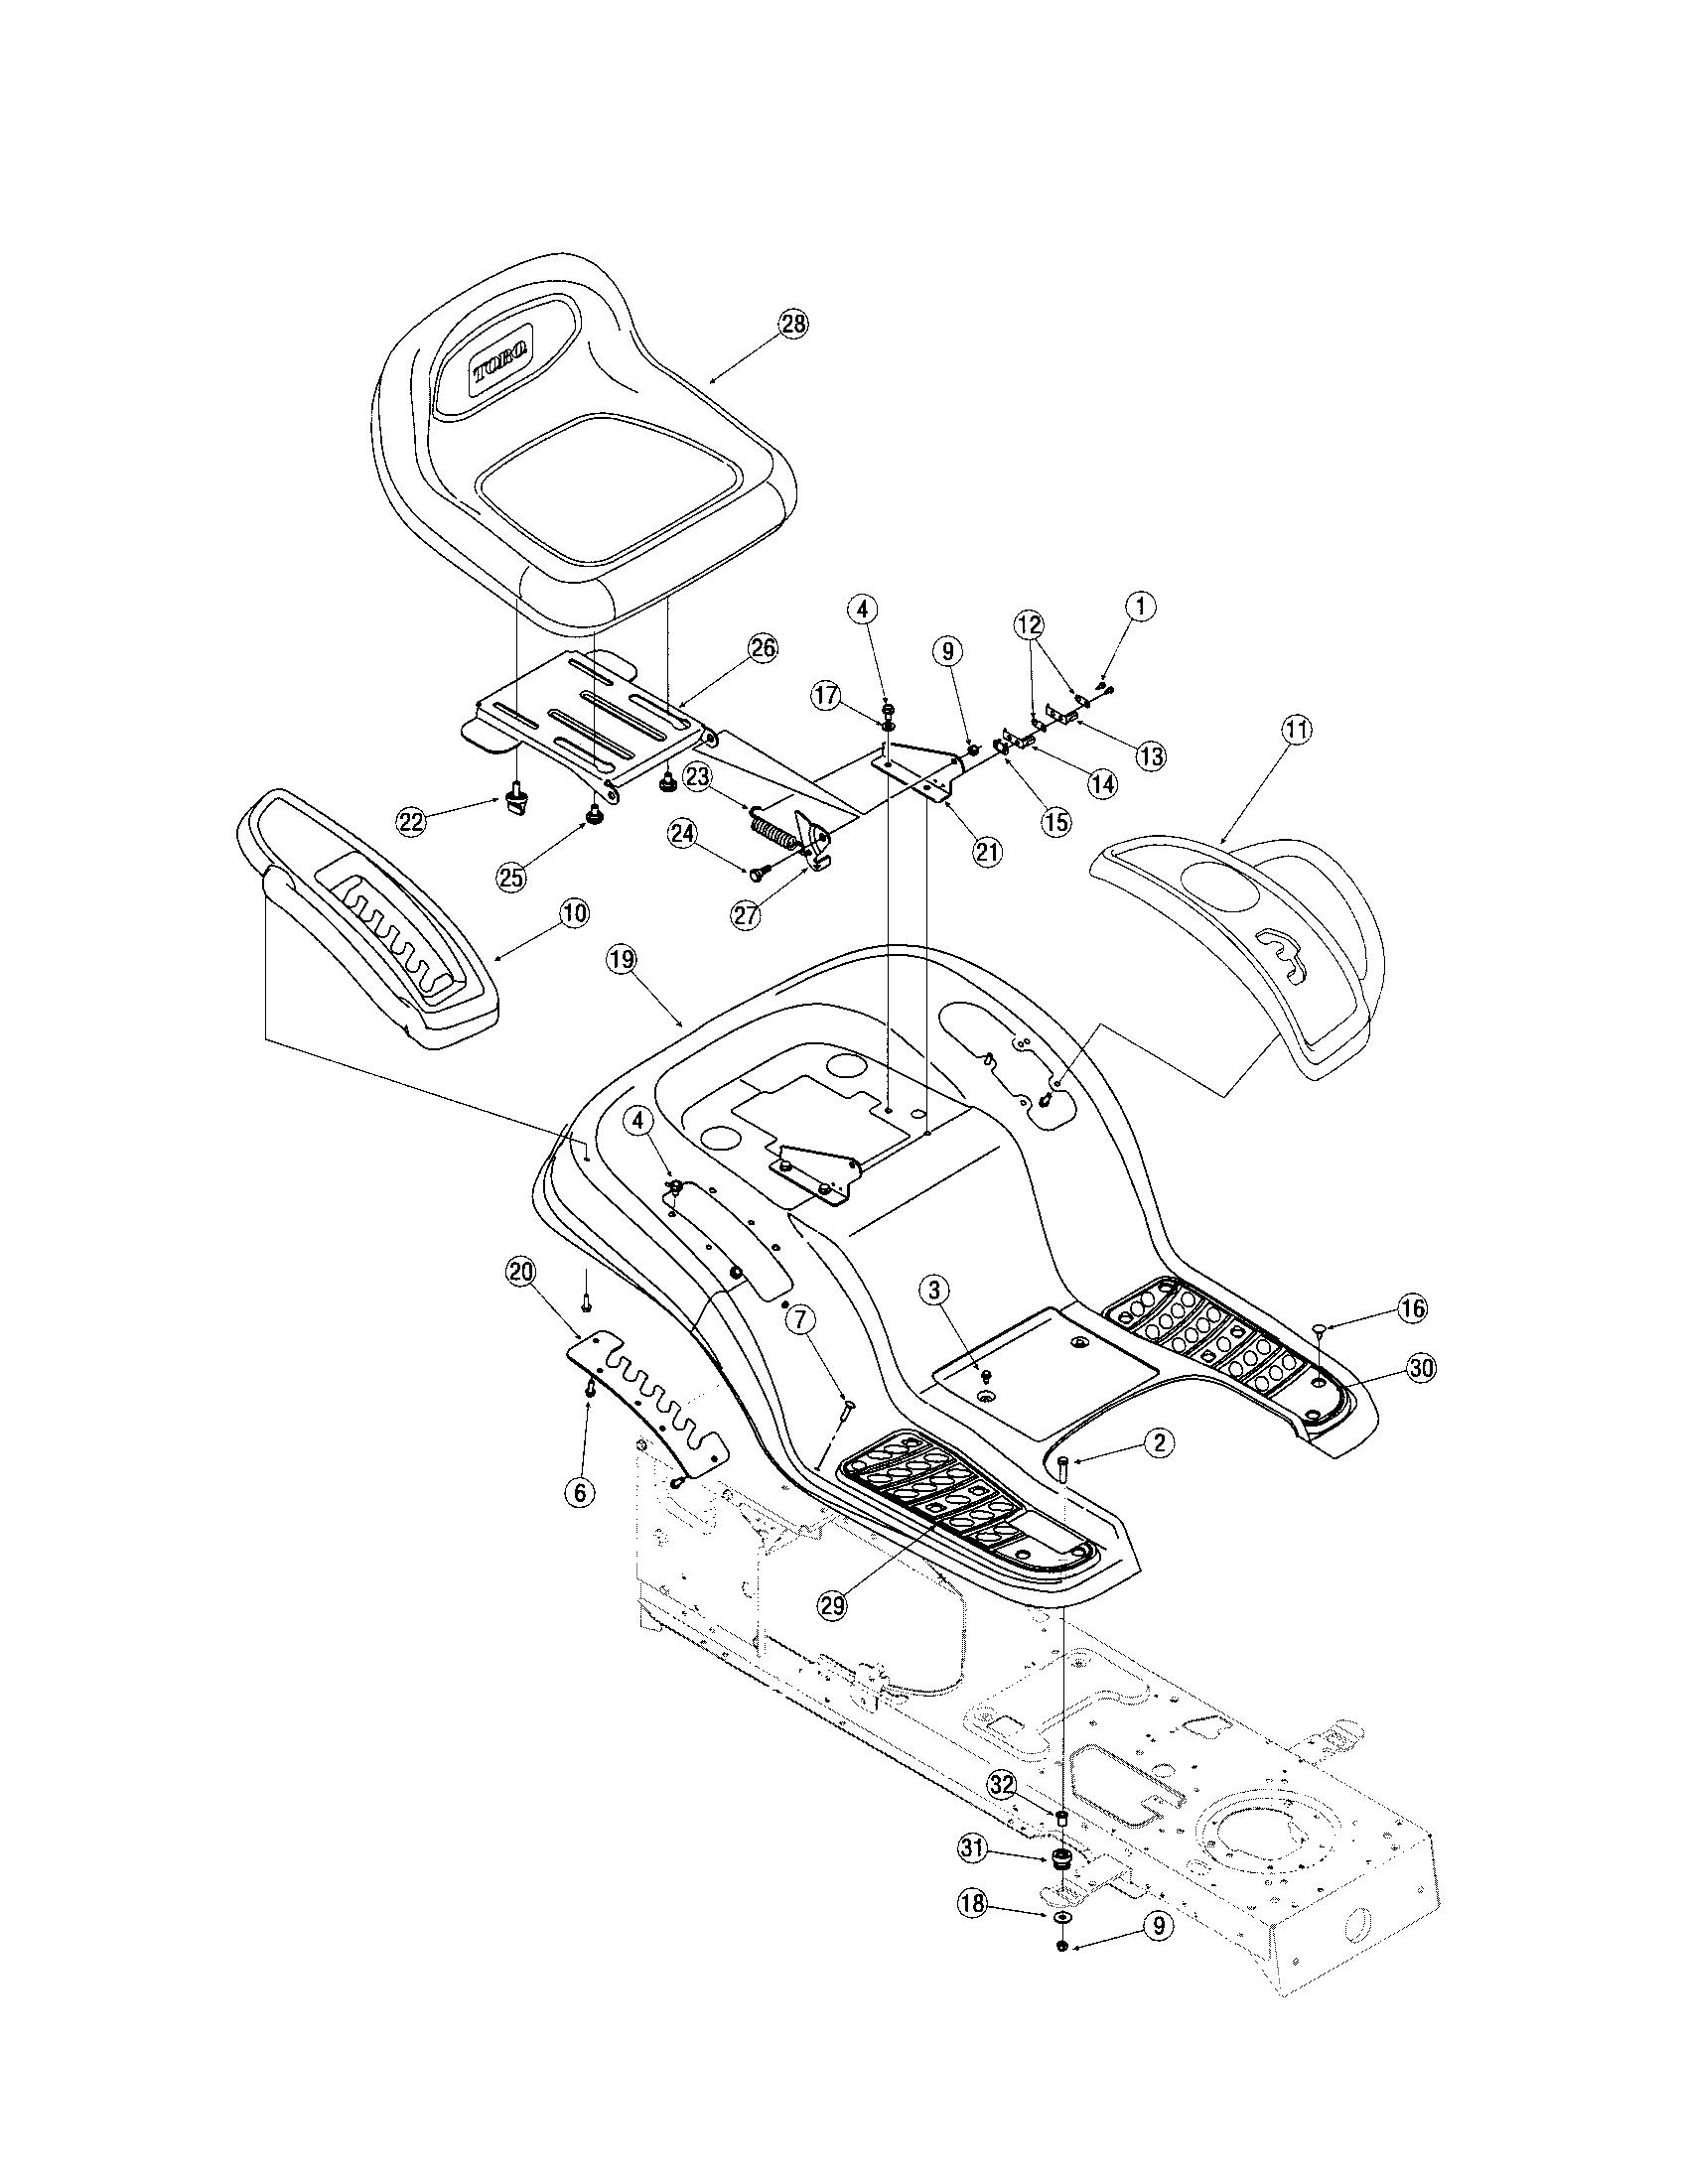 FENDER/SEAT Diagram & Parts List for Model 13AX60RG744